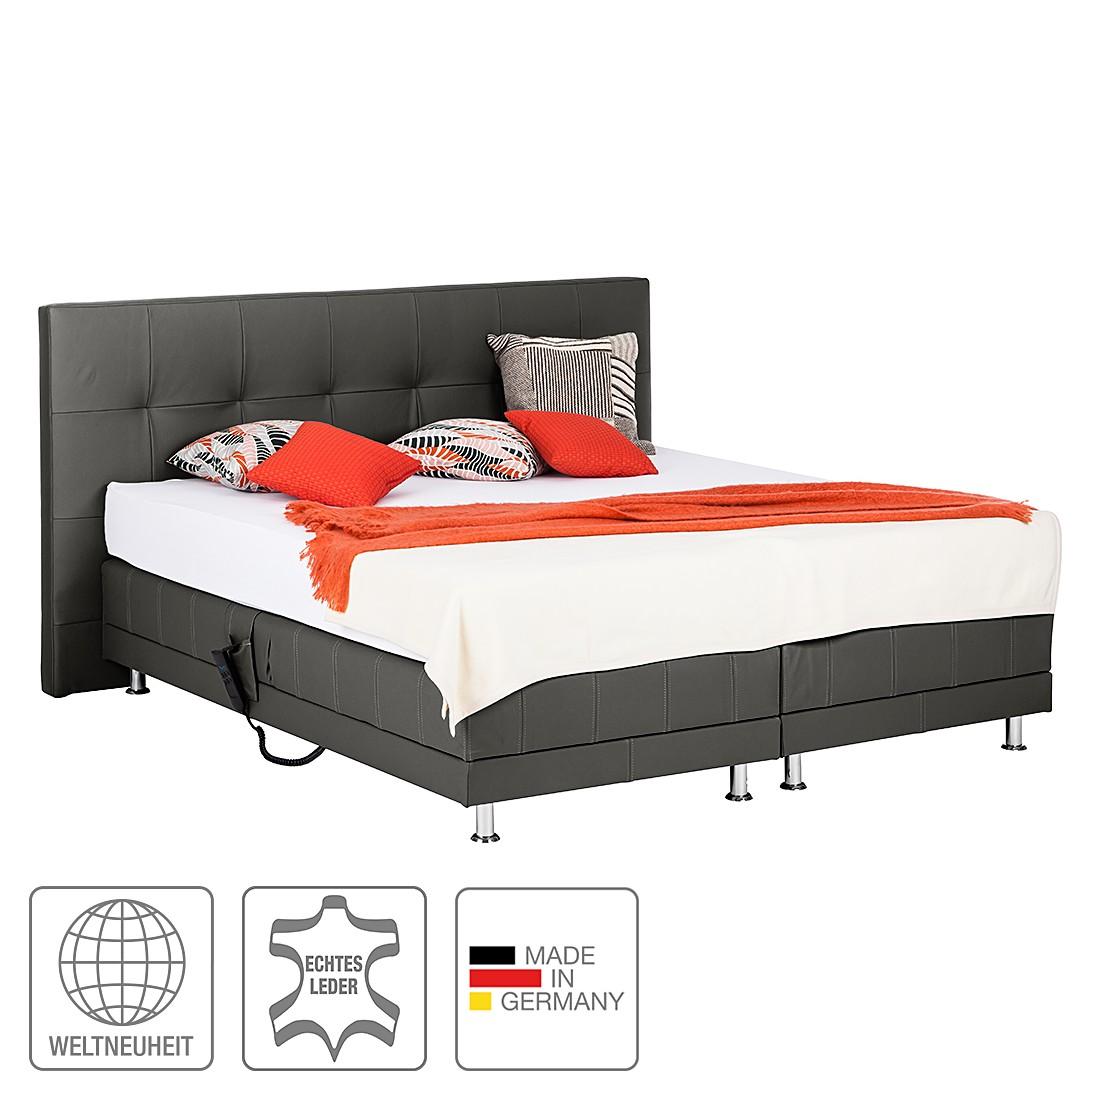 boxspringbett denver echtleder ohne topper 140 x 200cm h3 ab 80 kg schwarz art of. Black Bedroom Furniture Sets. Home Design Ideas